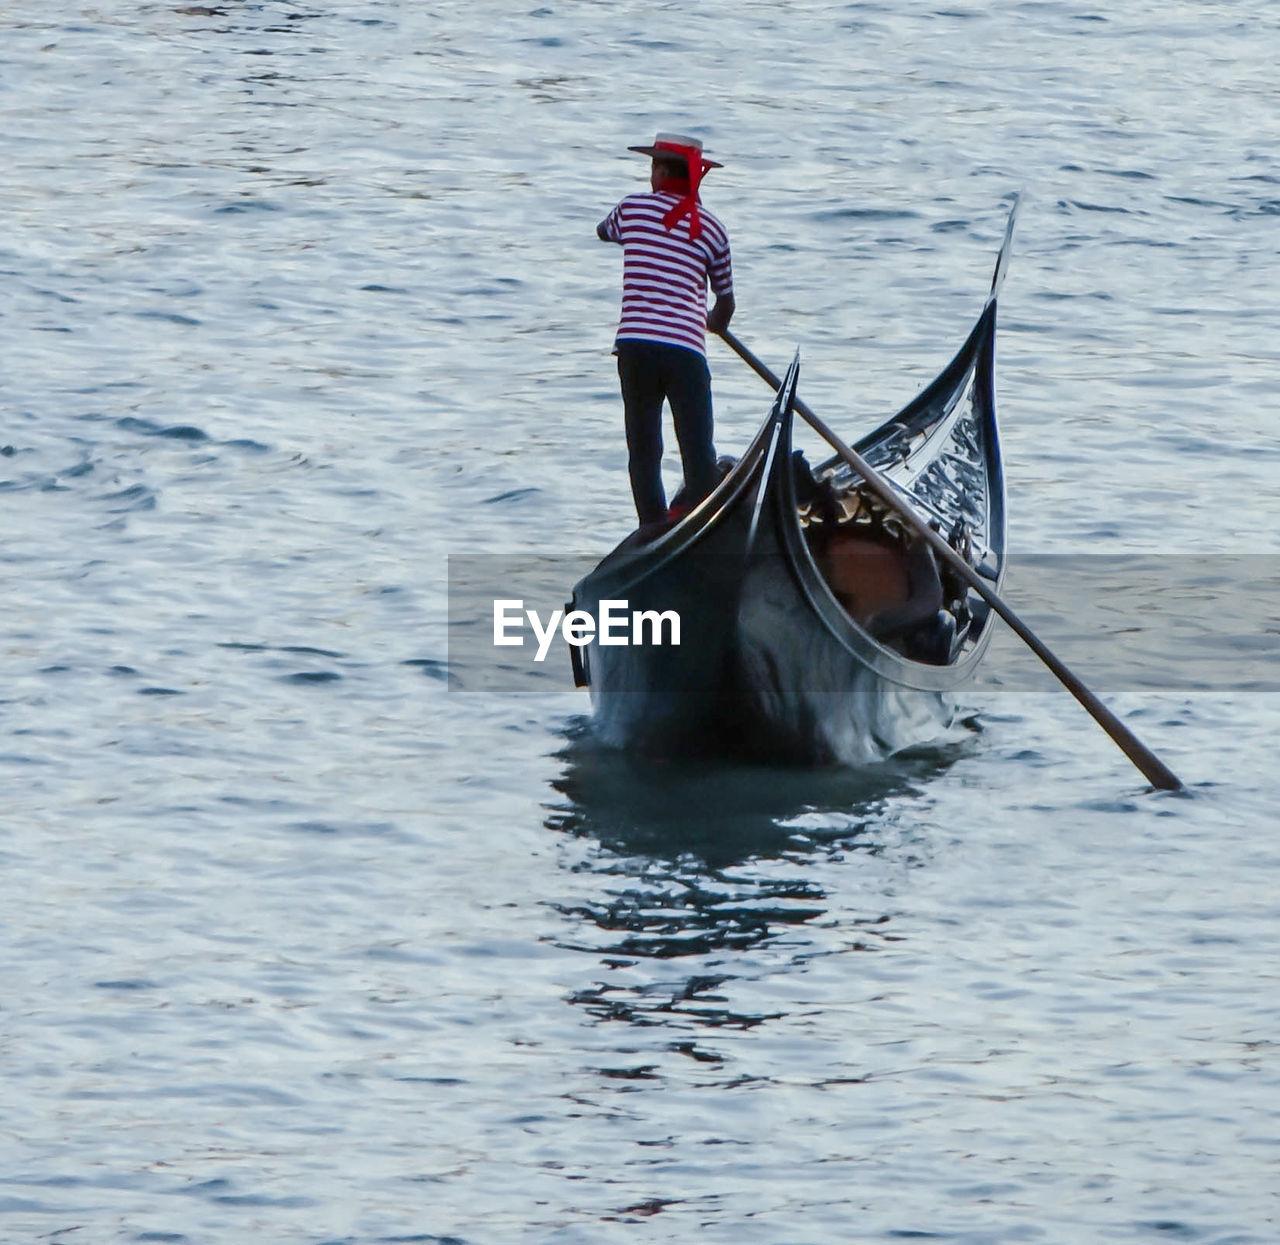 Gondolier Sailing On Gondola Over Grand Canal